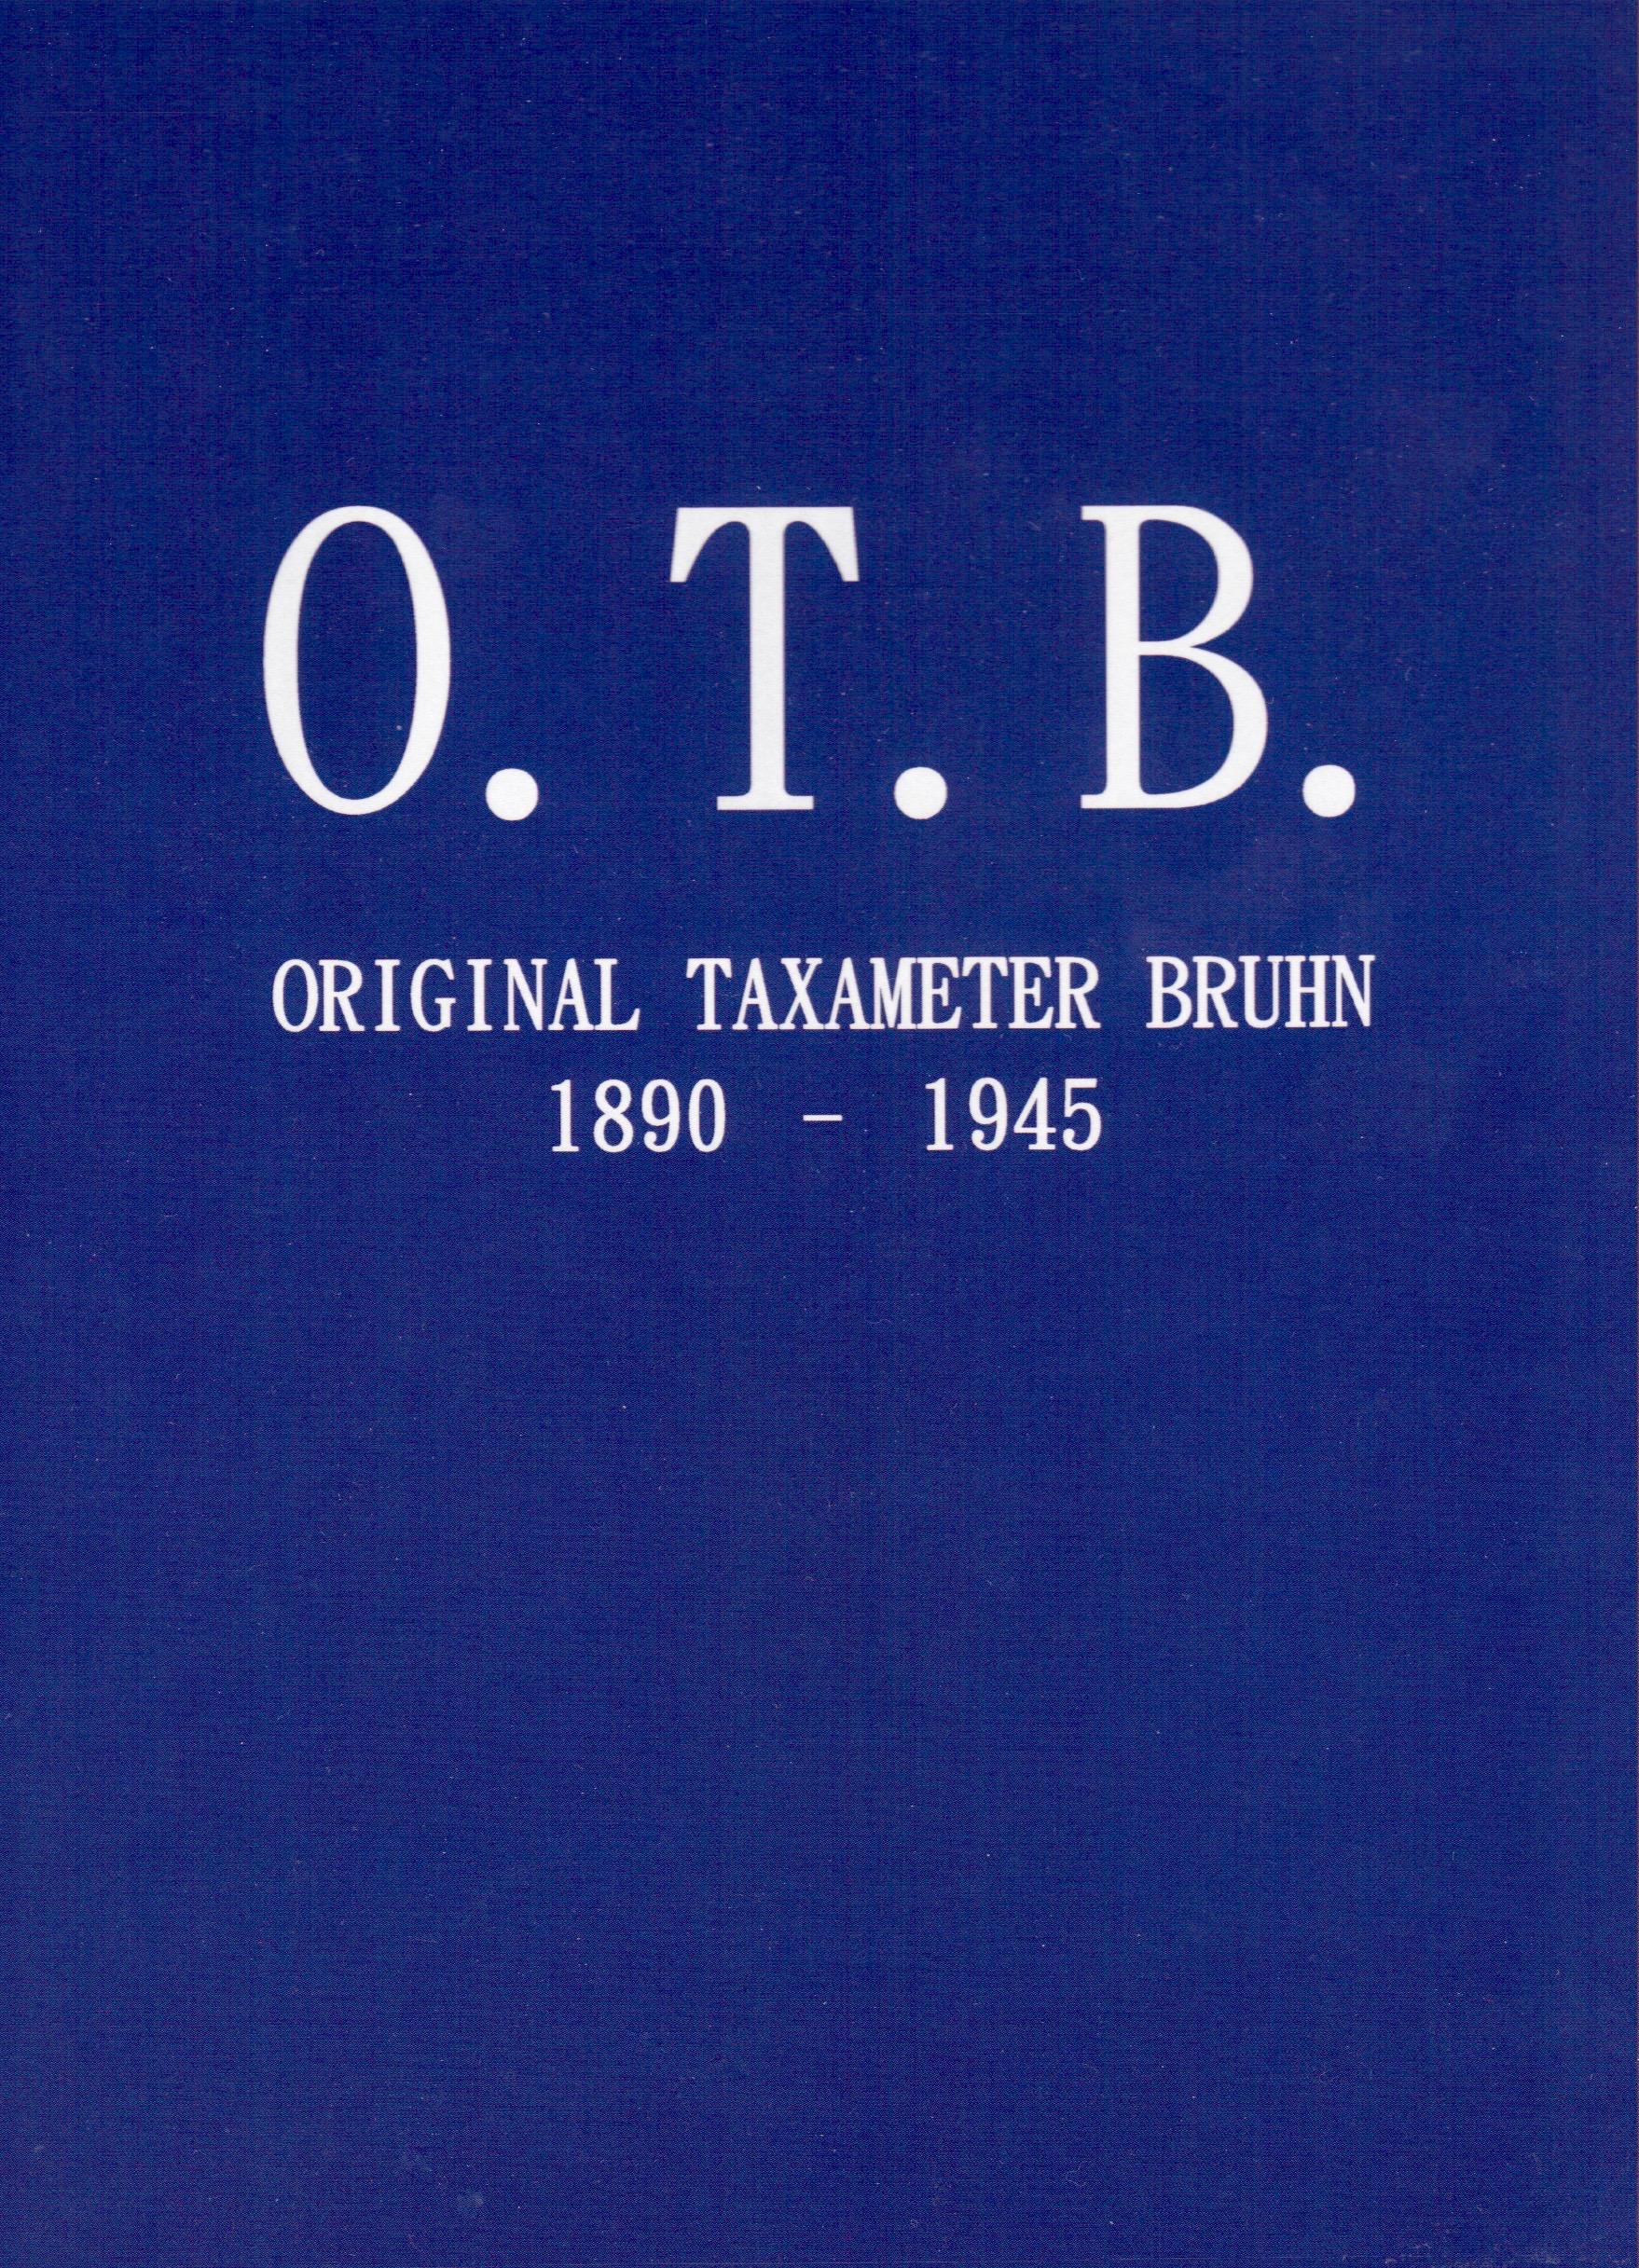 Original_Taxameter_Bruhn